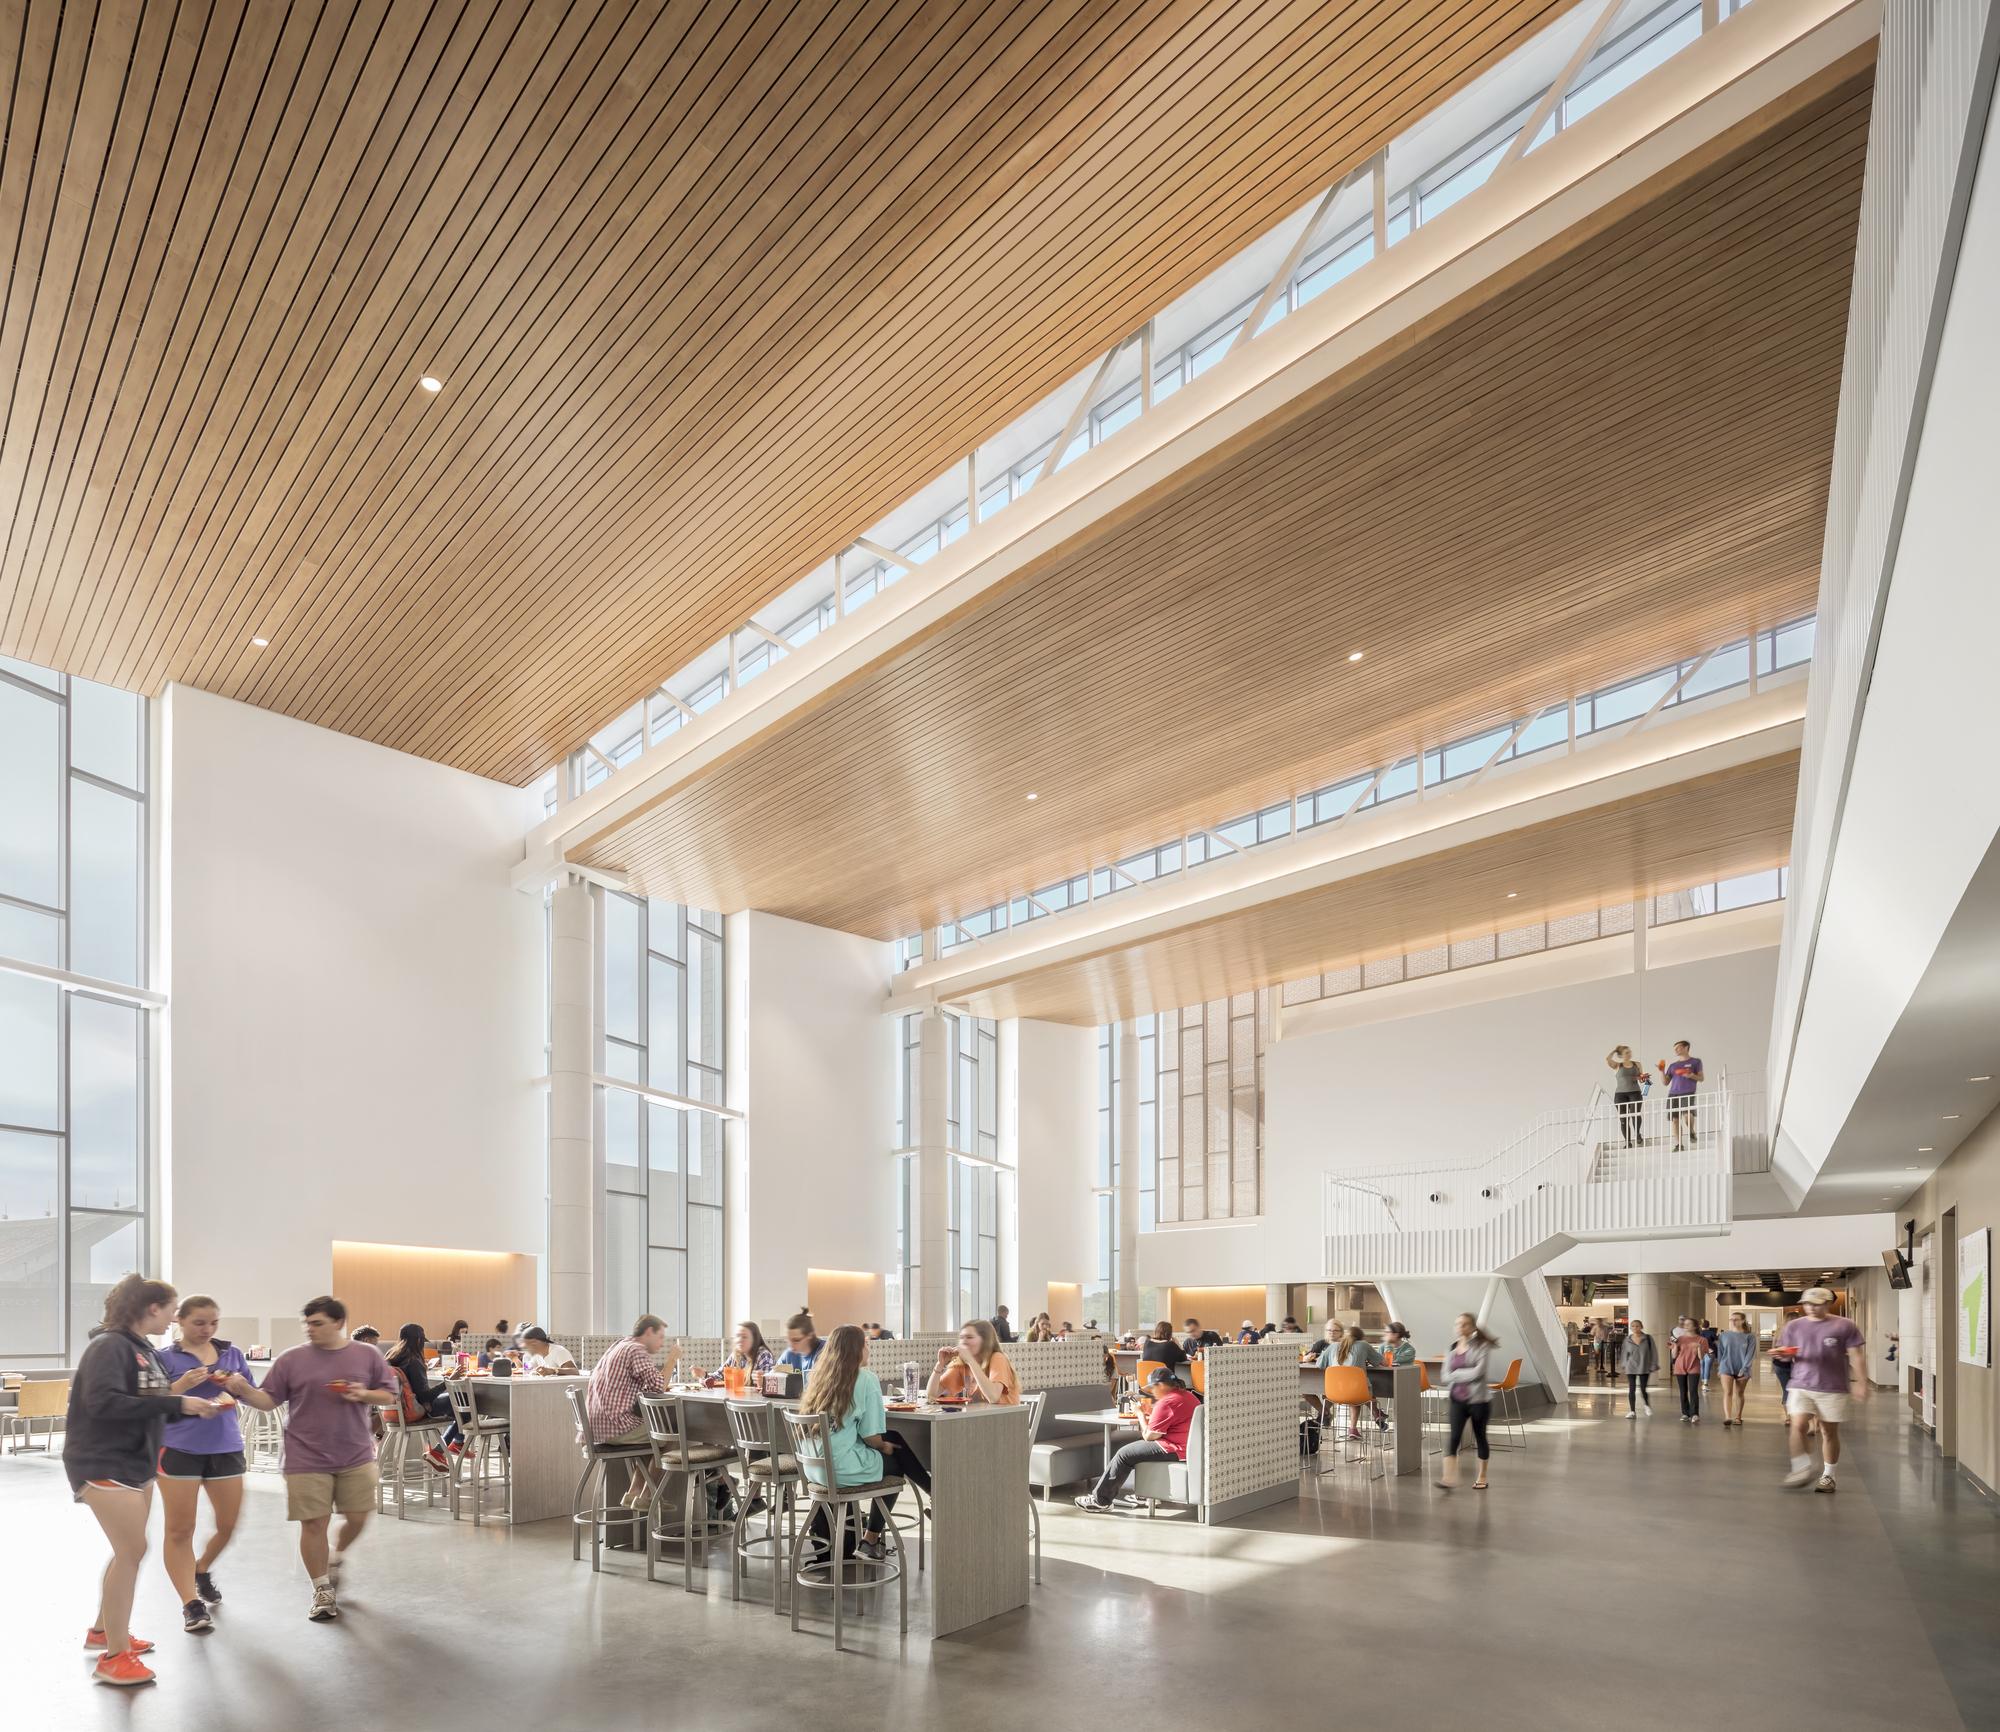 Dining Hall: Clemson University Core Campus Dining Facility / Sasaki